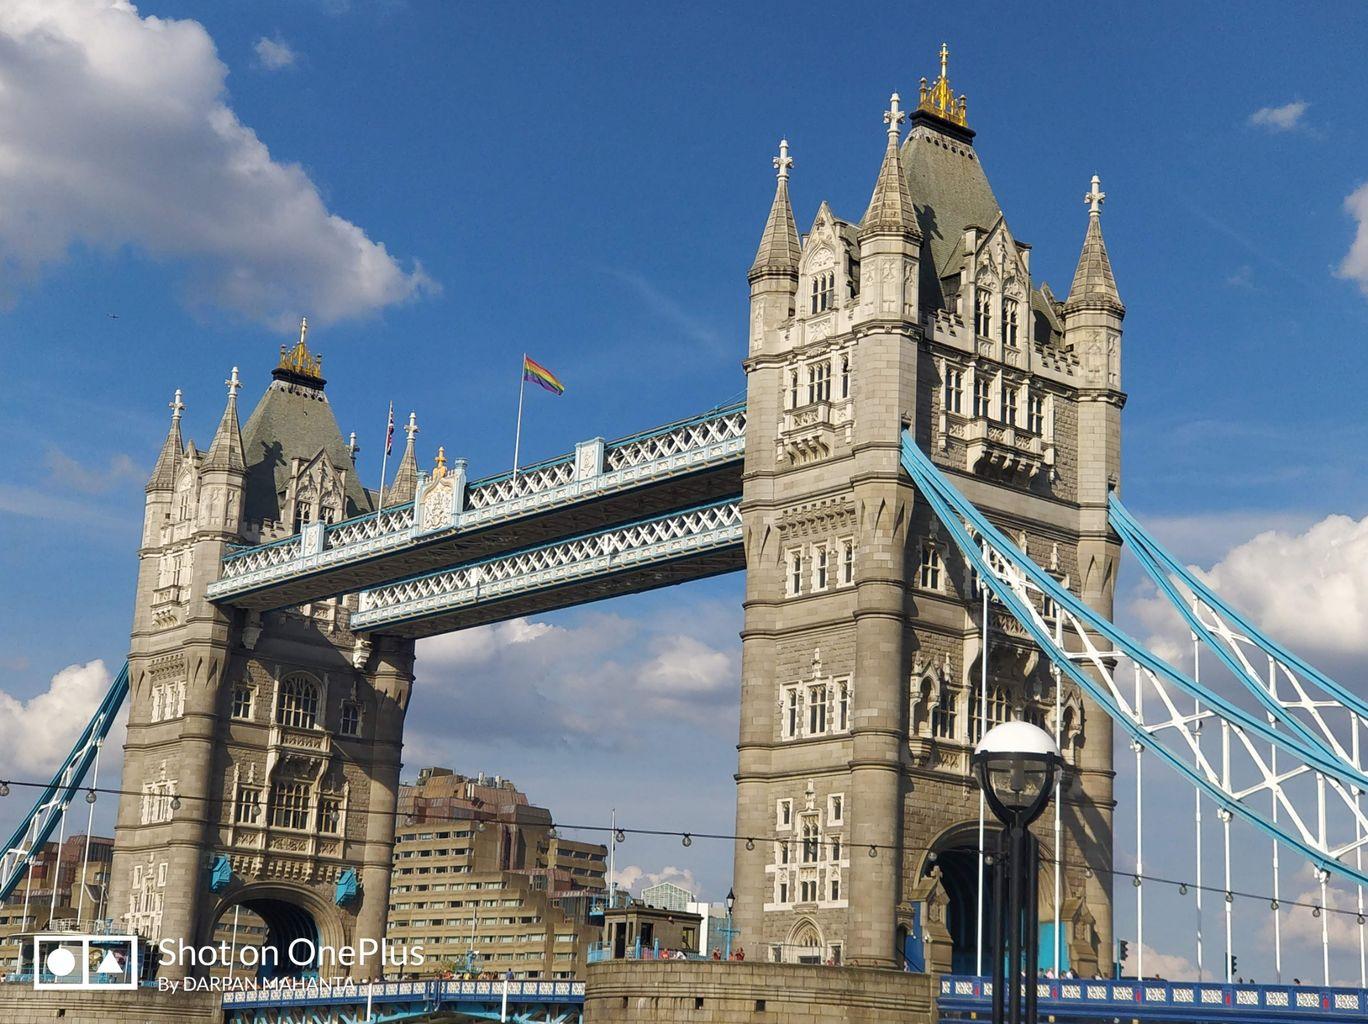 Photo of London By maddy mahanta